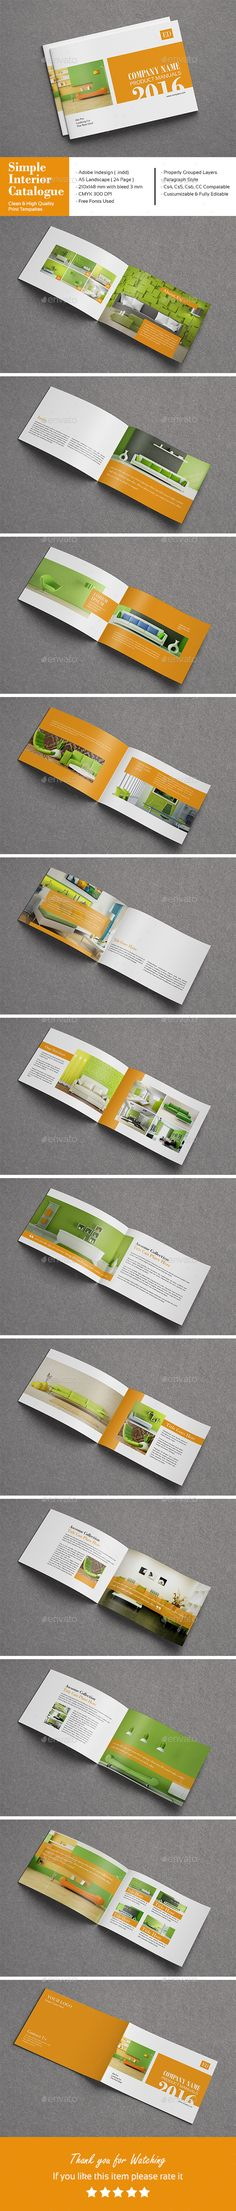 Minimal Architecture Brochure Templates  Minimal Architecture